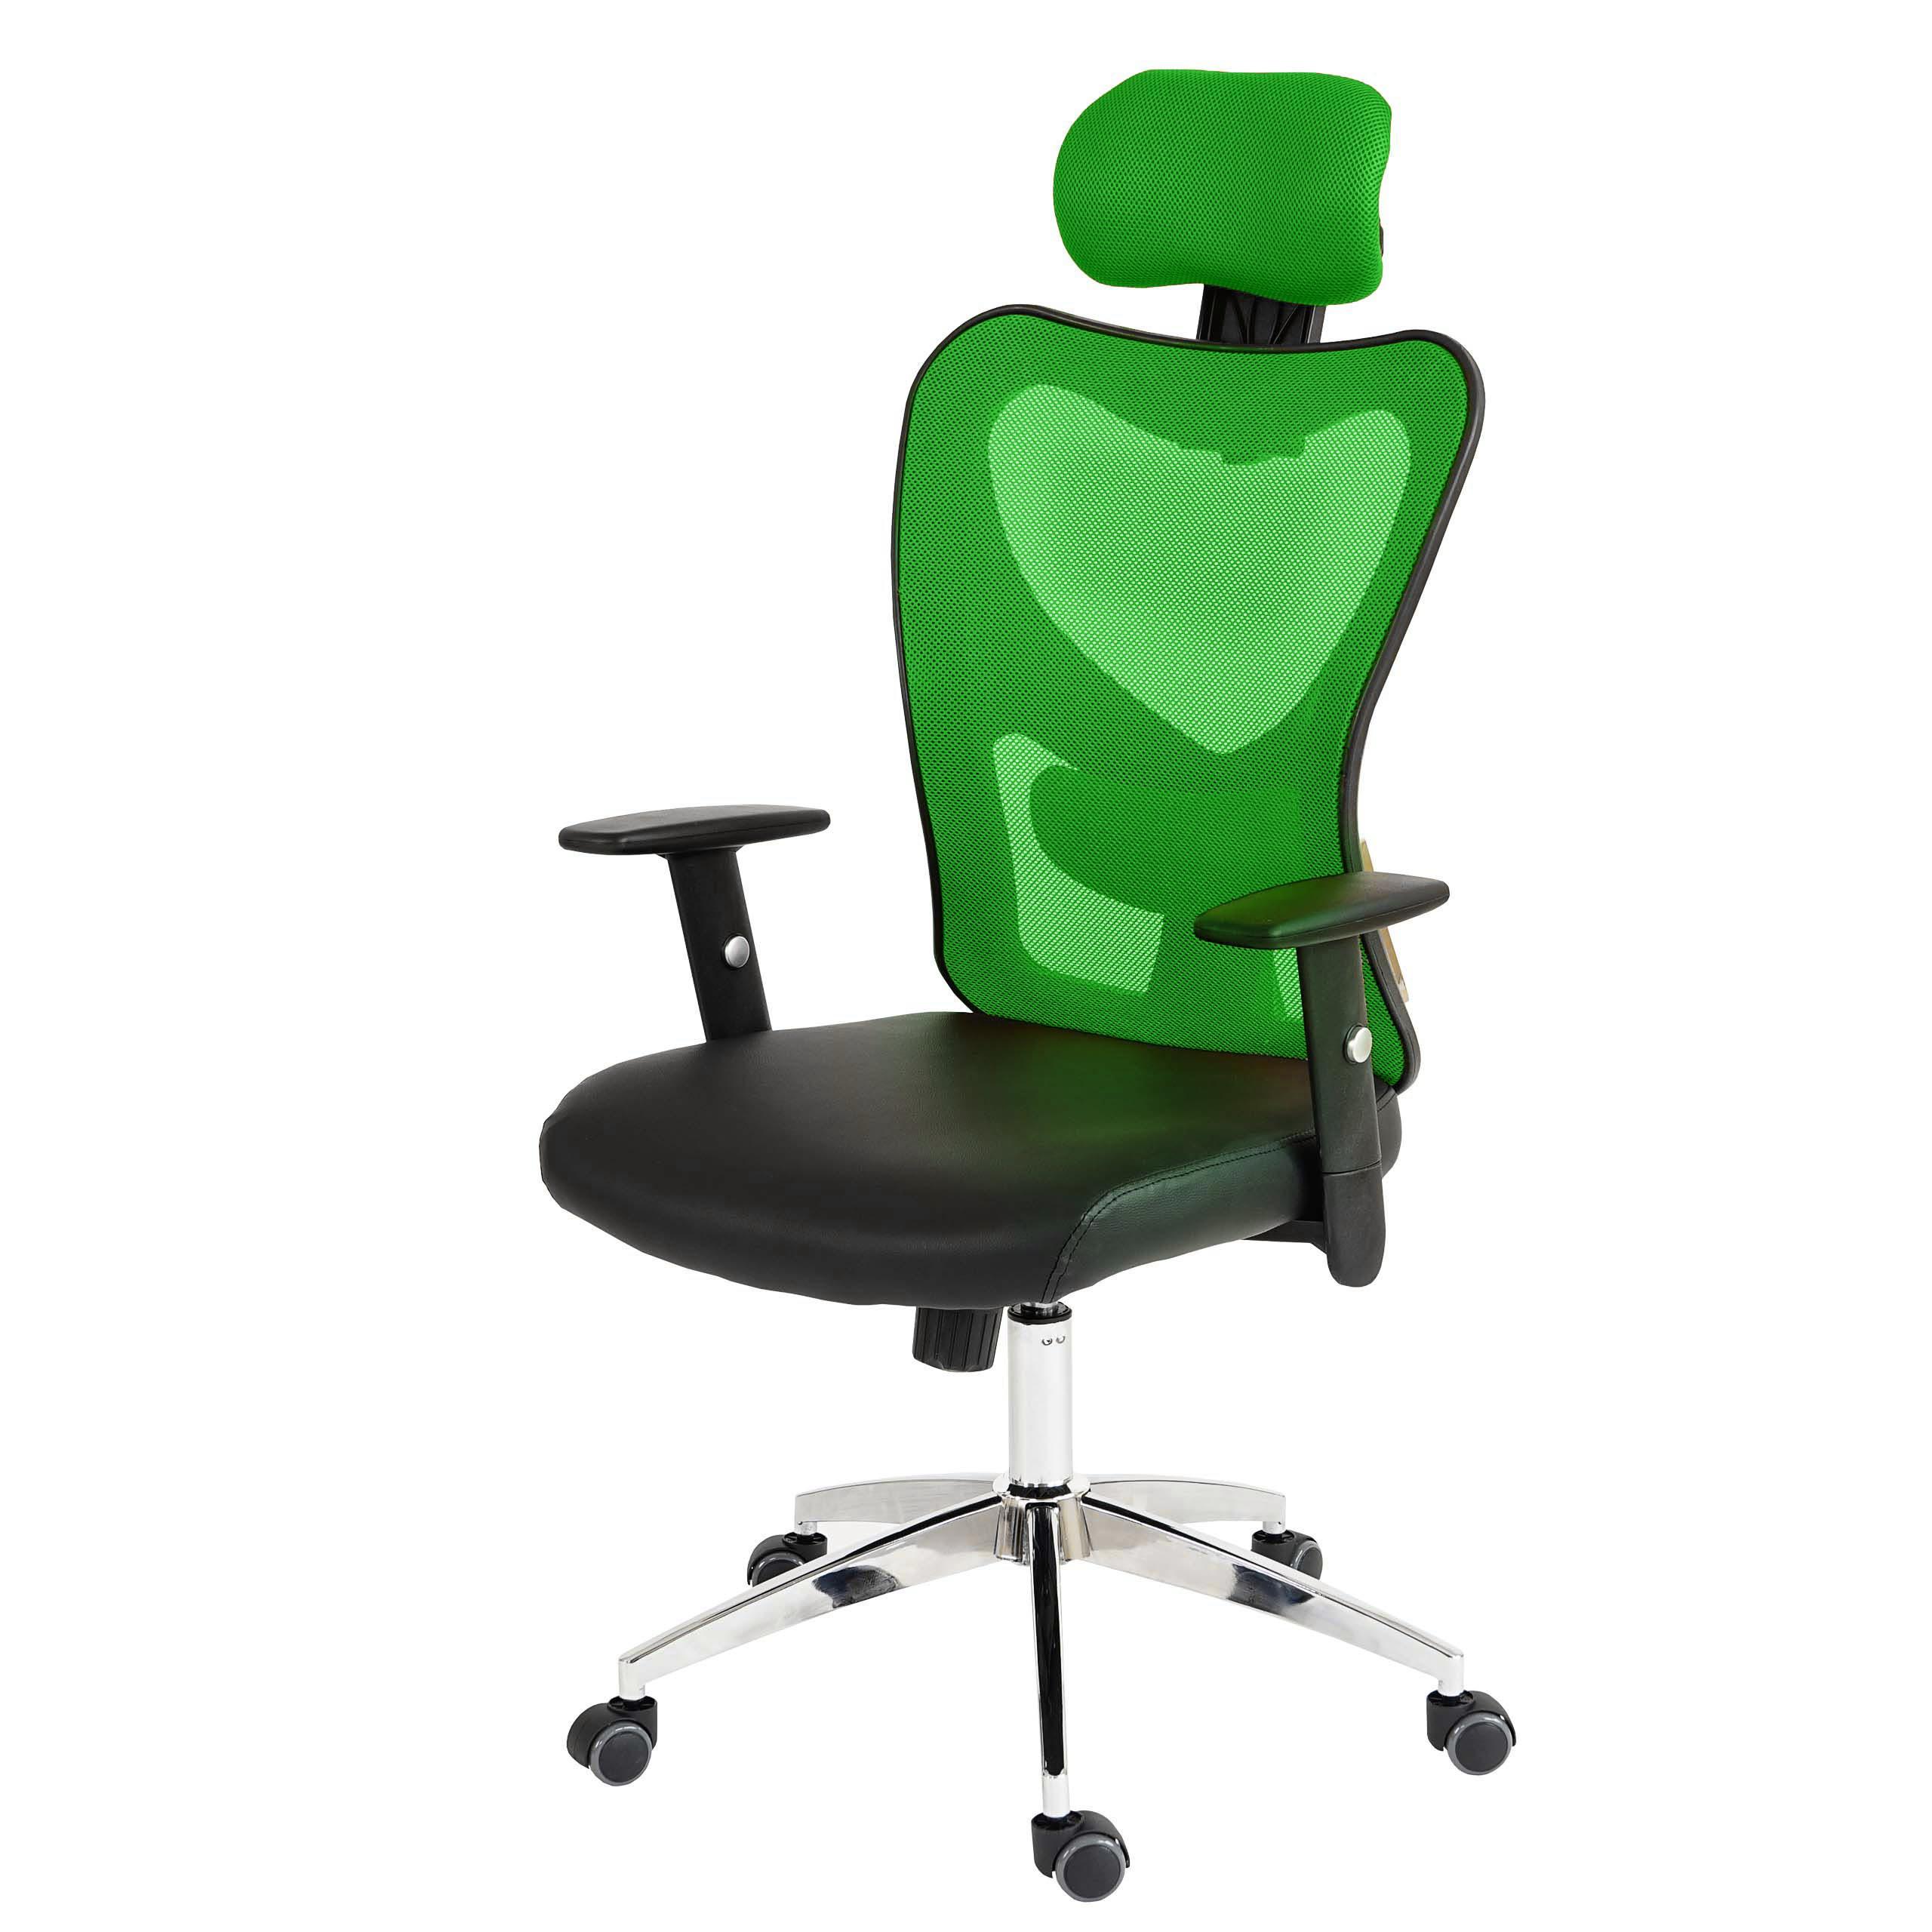 fauteuil de bureau am ricain atlanta xxl charge 150kg similicuir vert ebay. Black Bedroom Furniture Sets. Home Design Ideas